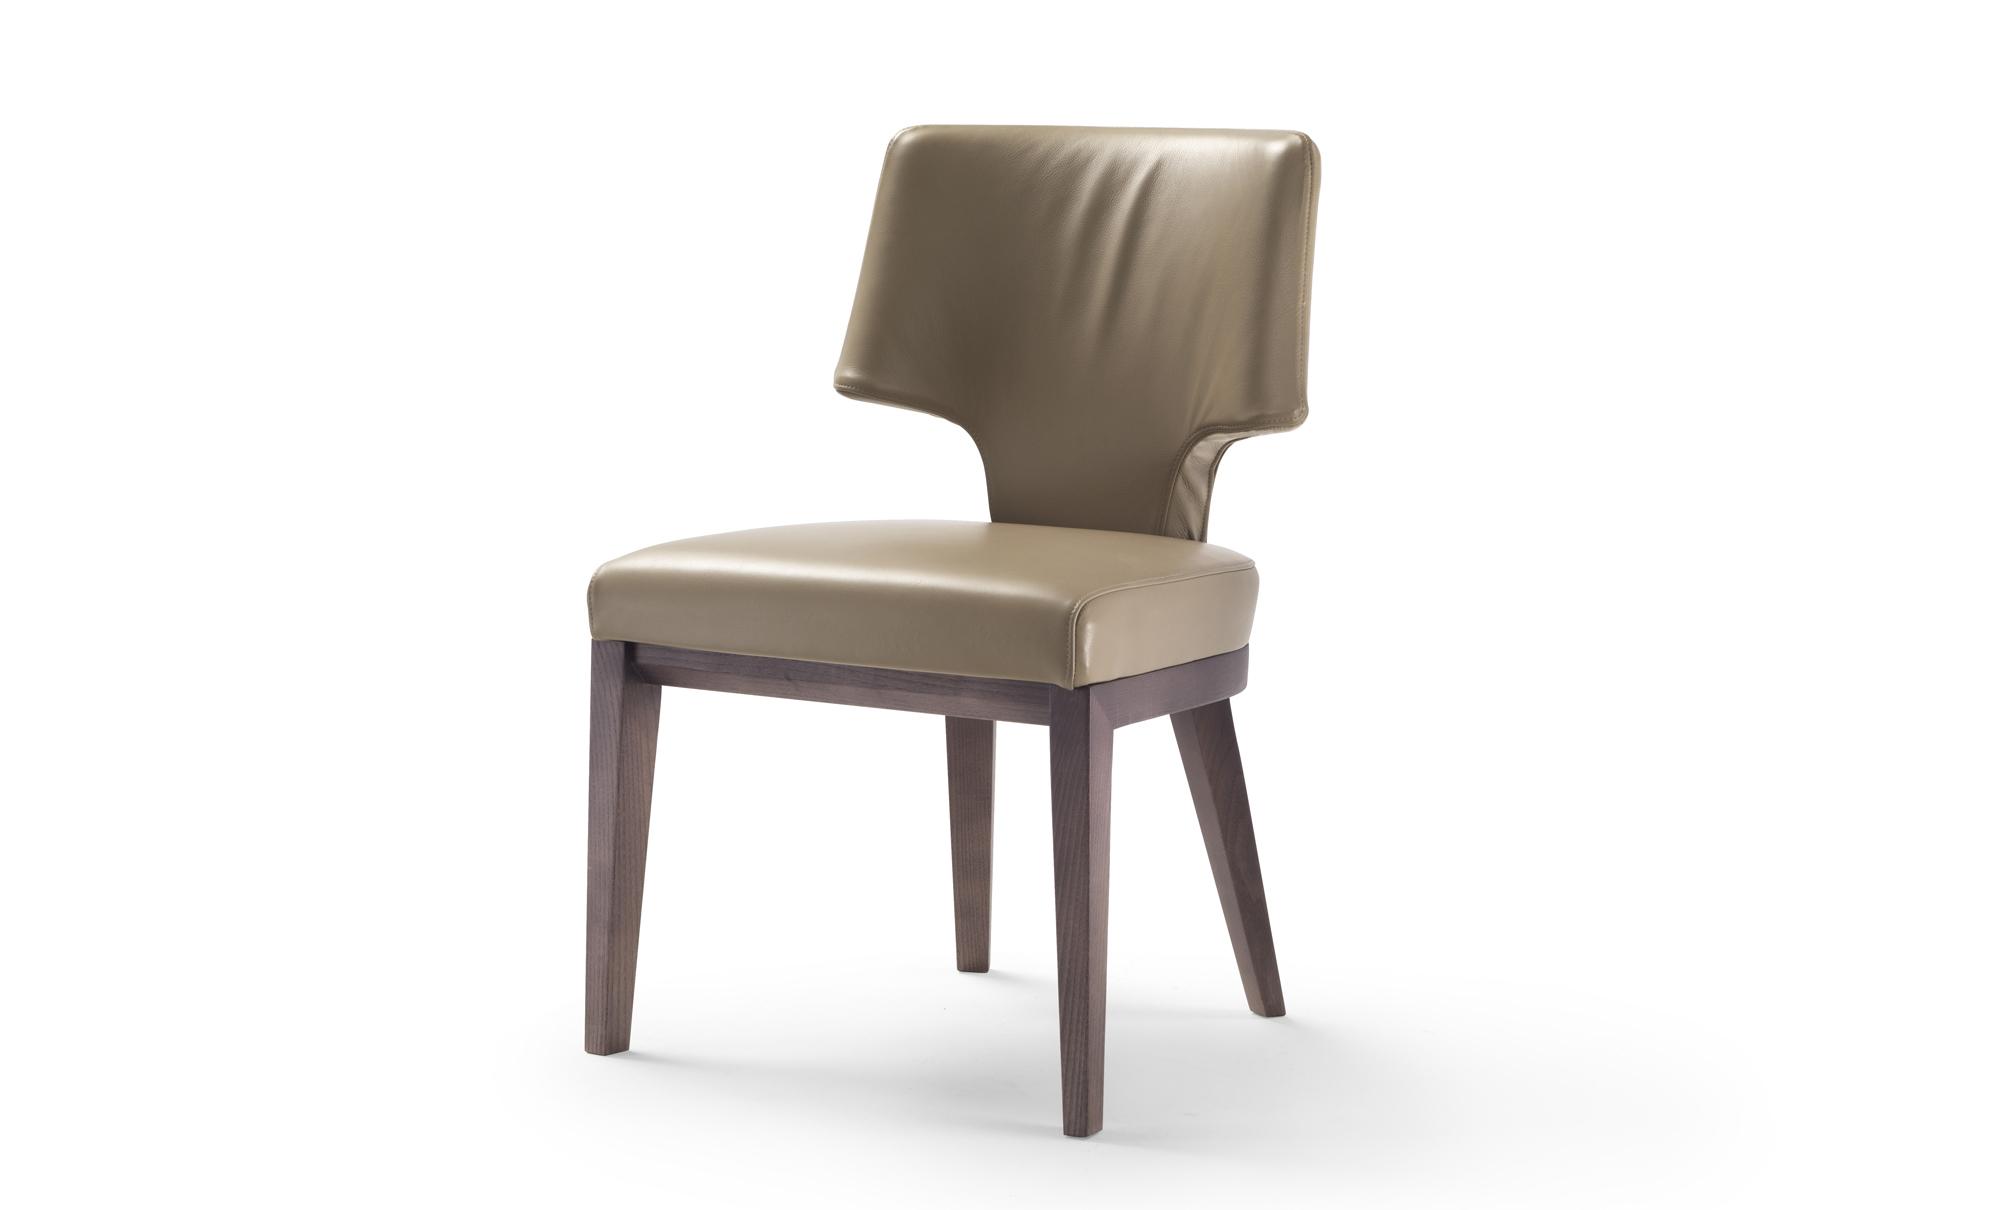 italian dining chairs australia clear chiavari aline chair by flexform mood fanuli furniture